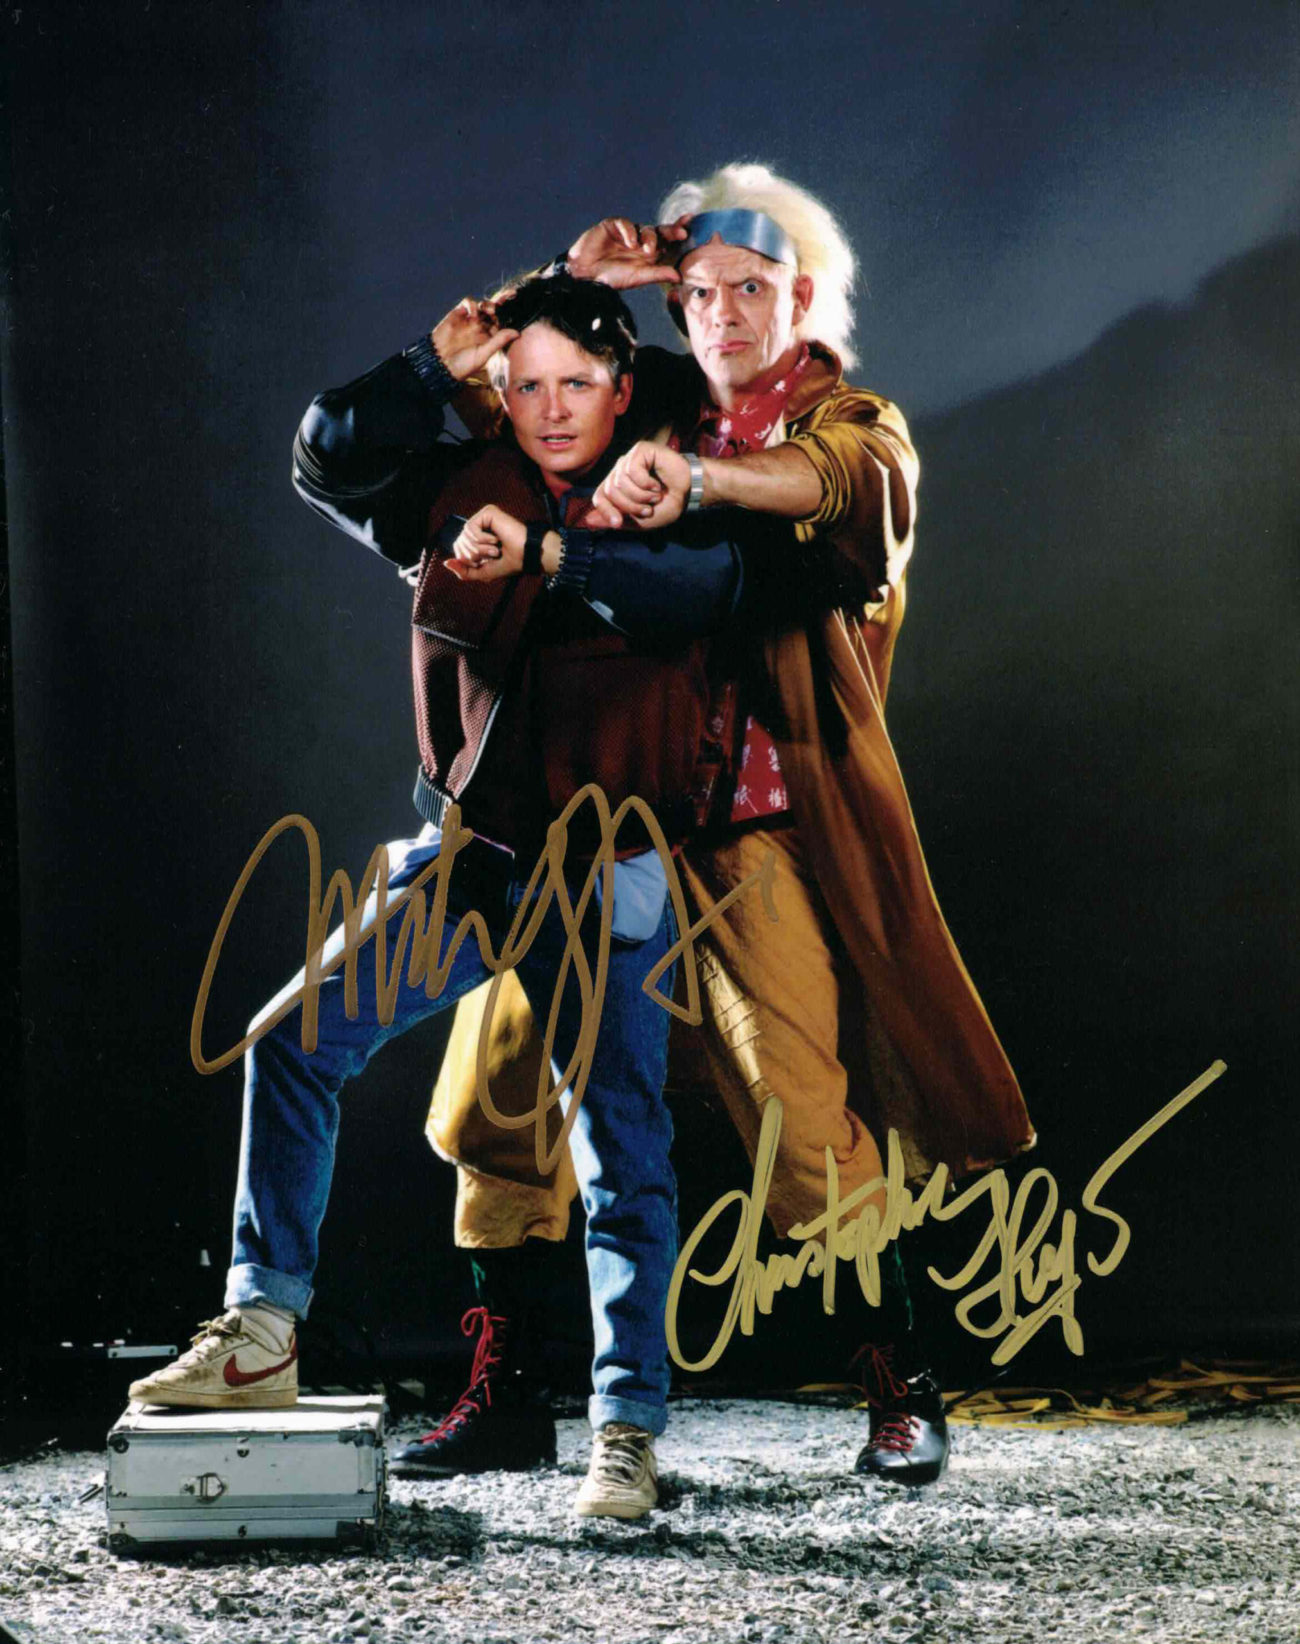 Christopher Lloyd & Michael J. Fox / Návrat do budoucnosti - autogram